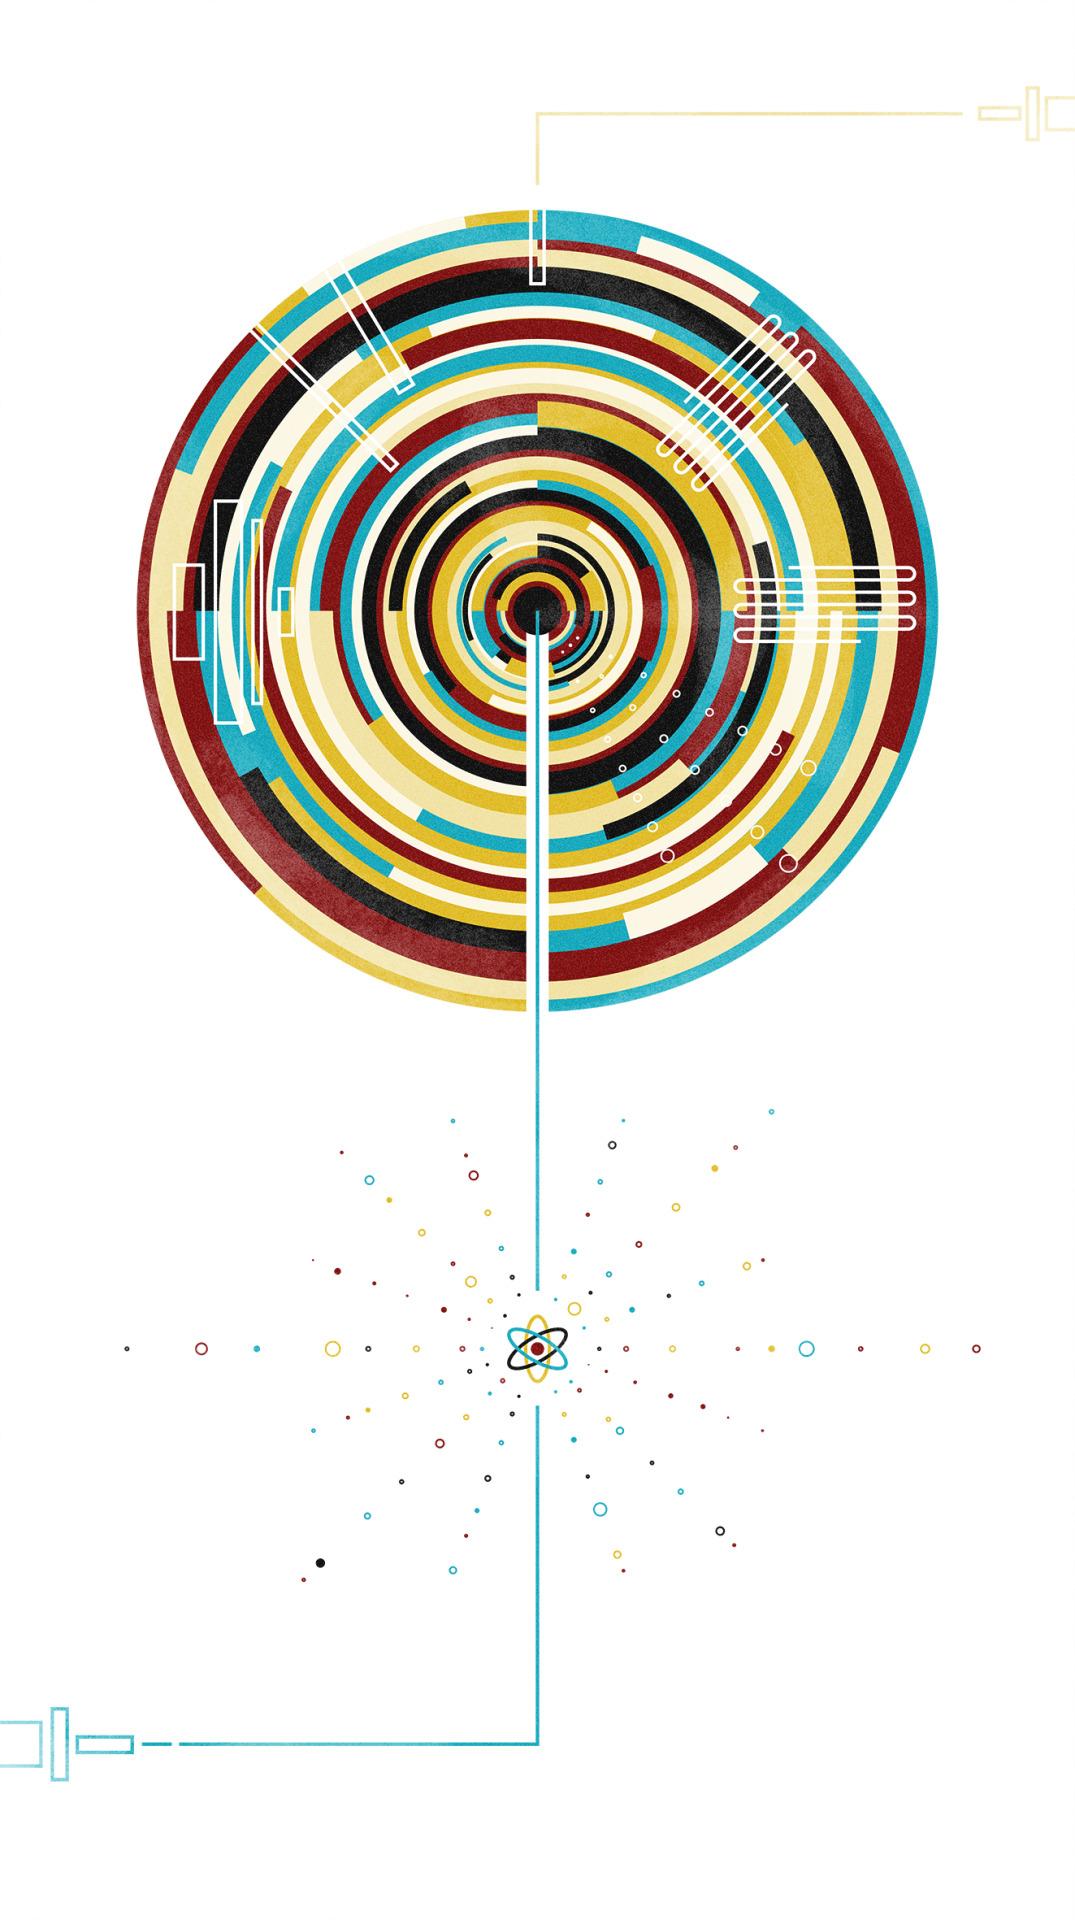 Hadron Collider Detector: Large